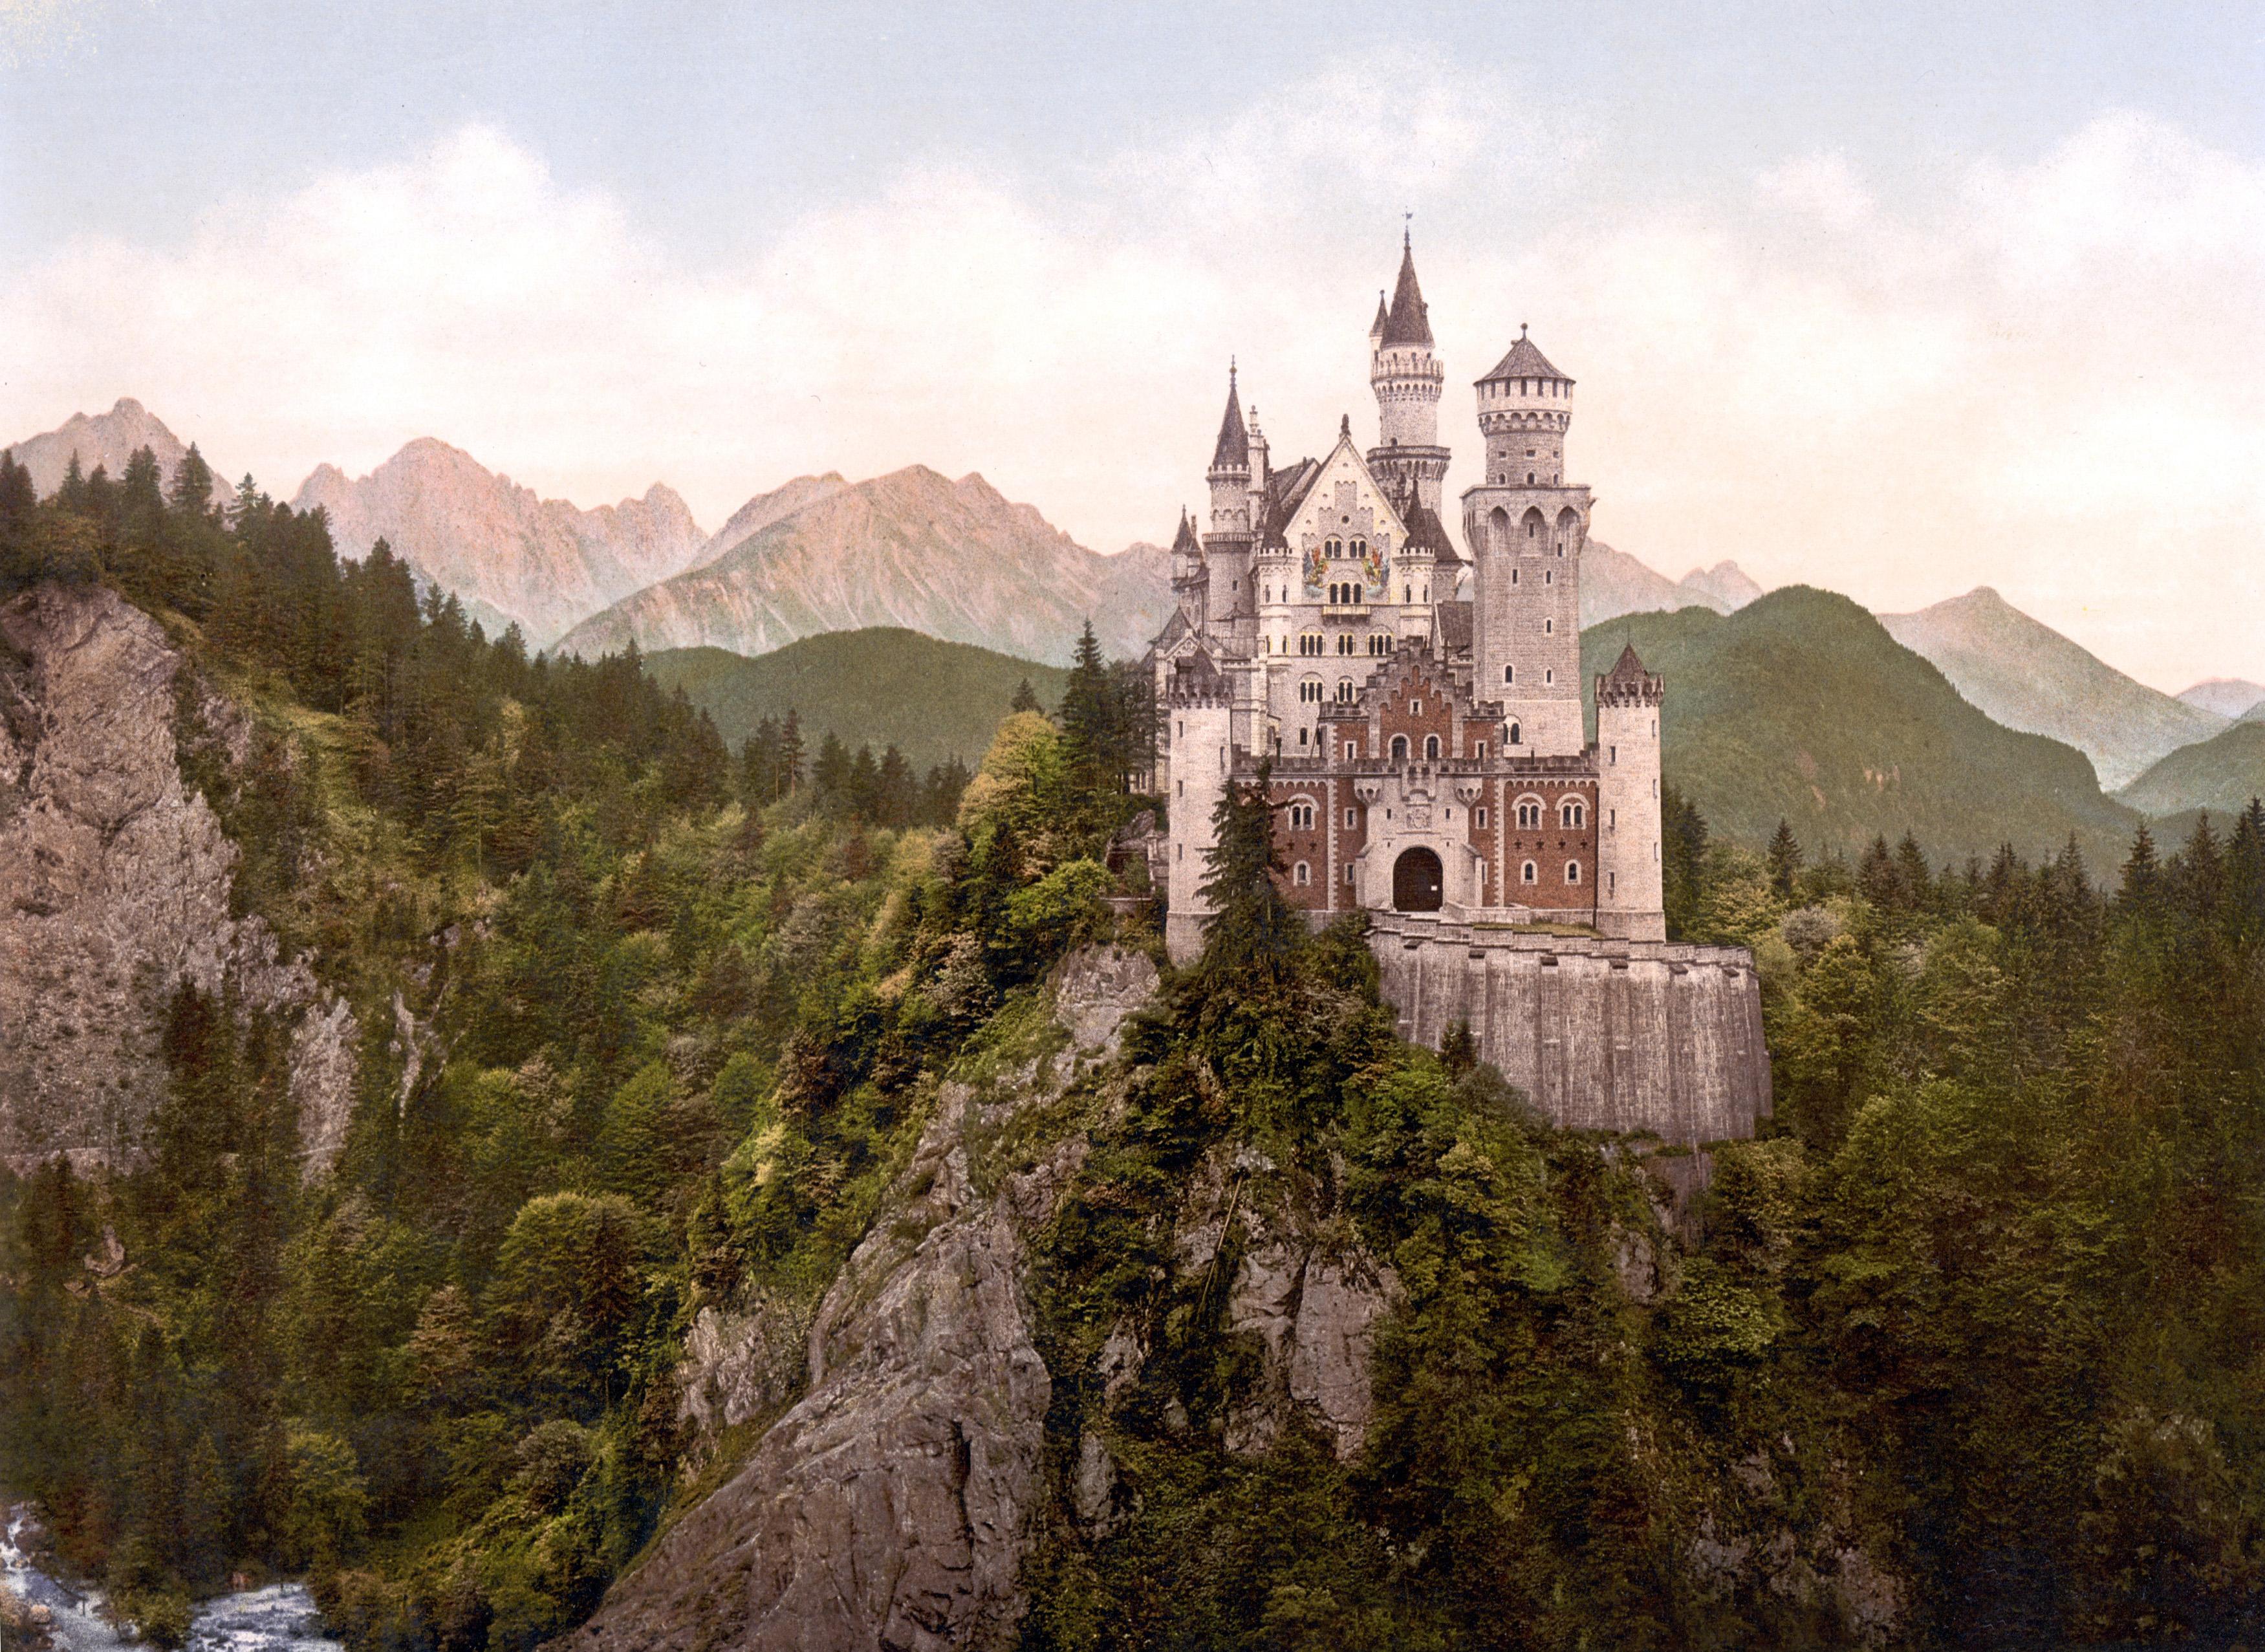 HQ Castle Wallpapers | File 3134.48Kb